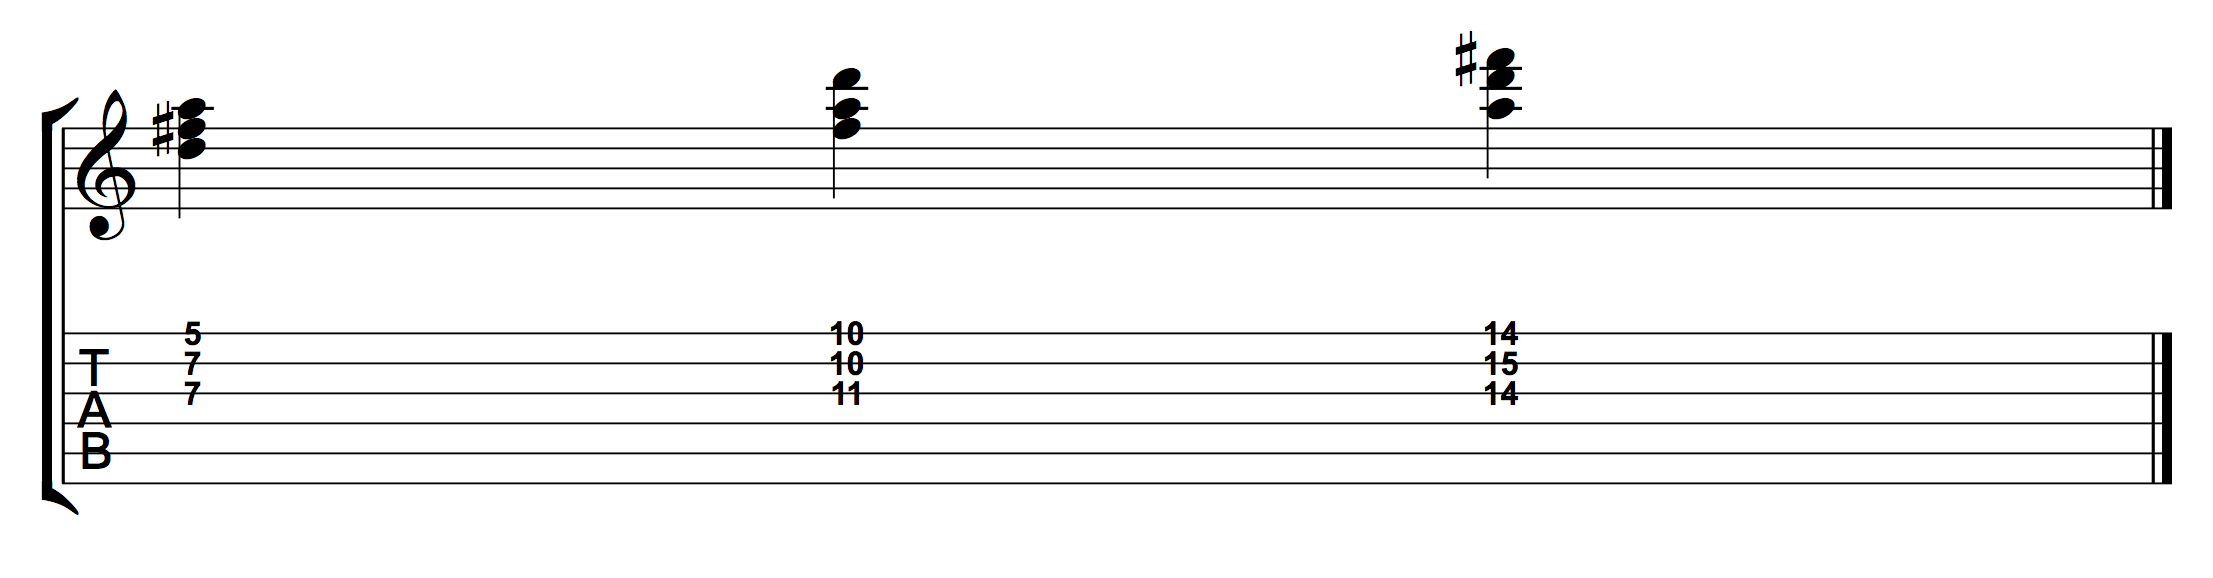 Guitar Triad Chord Shapes